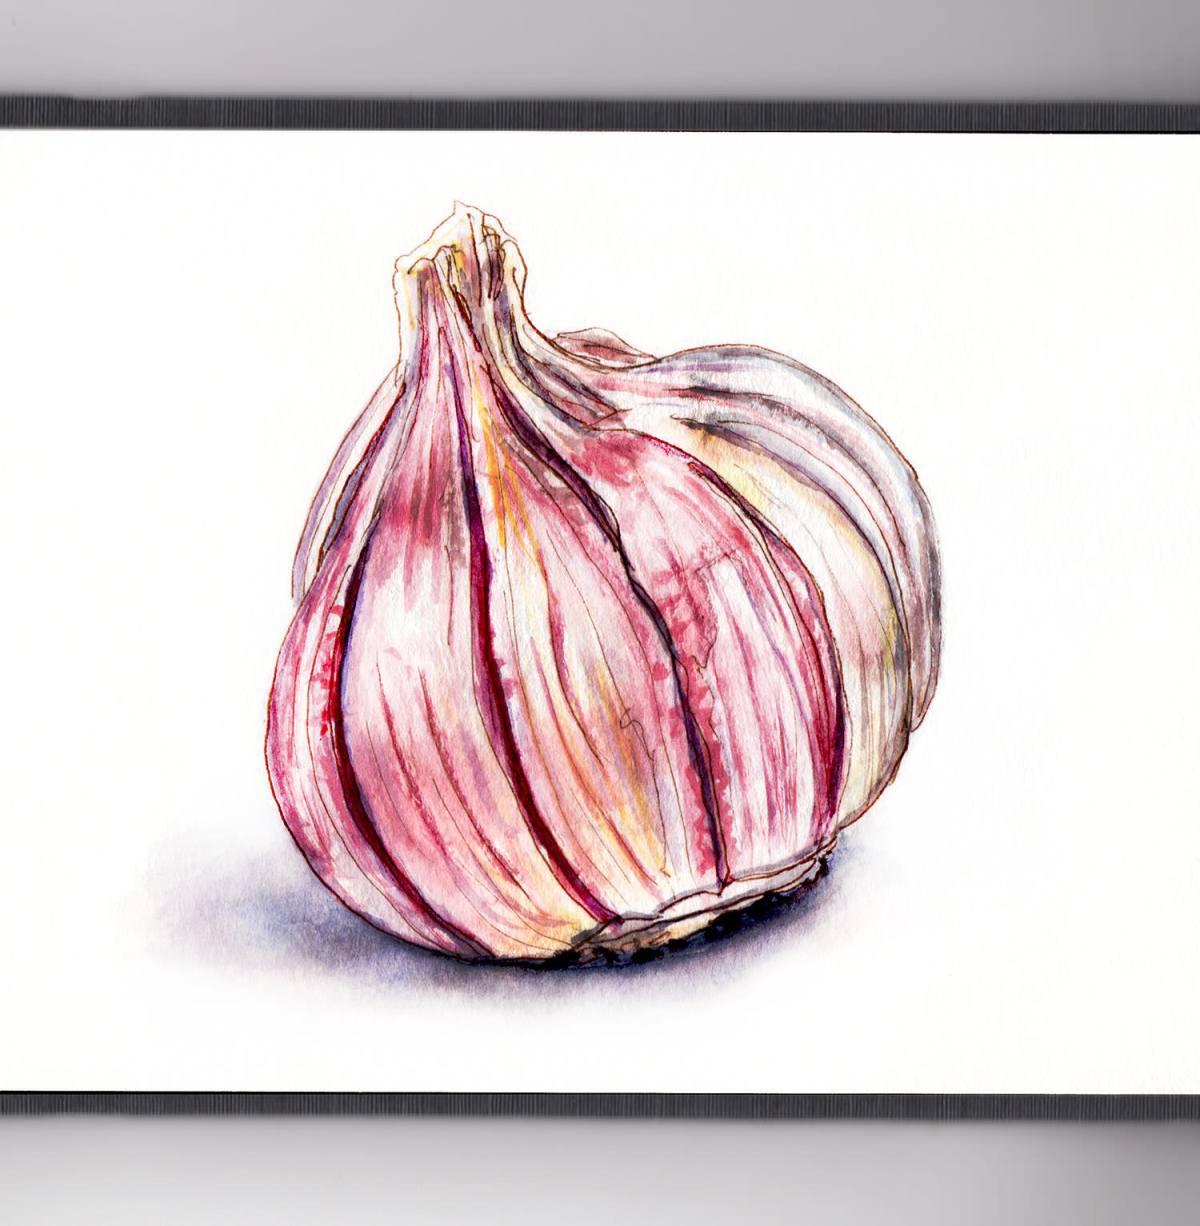 Day 22 - #WorldWatercolorGroup - Bumpy Purple Garlic Cloves - #doodlewash